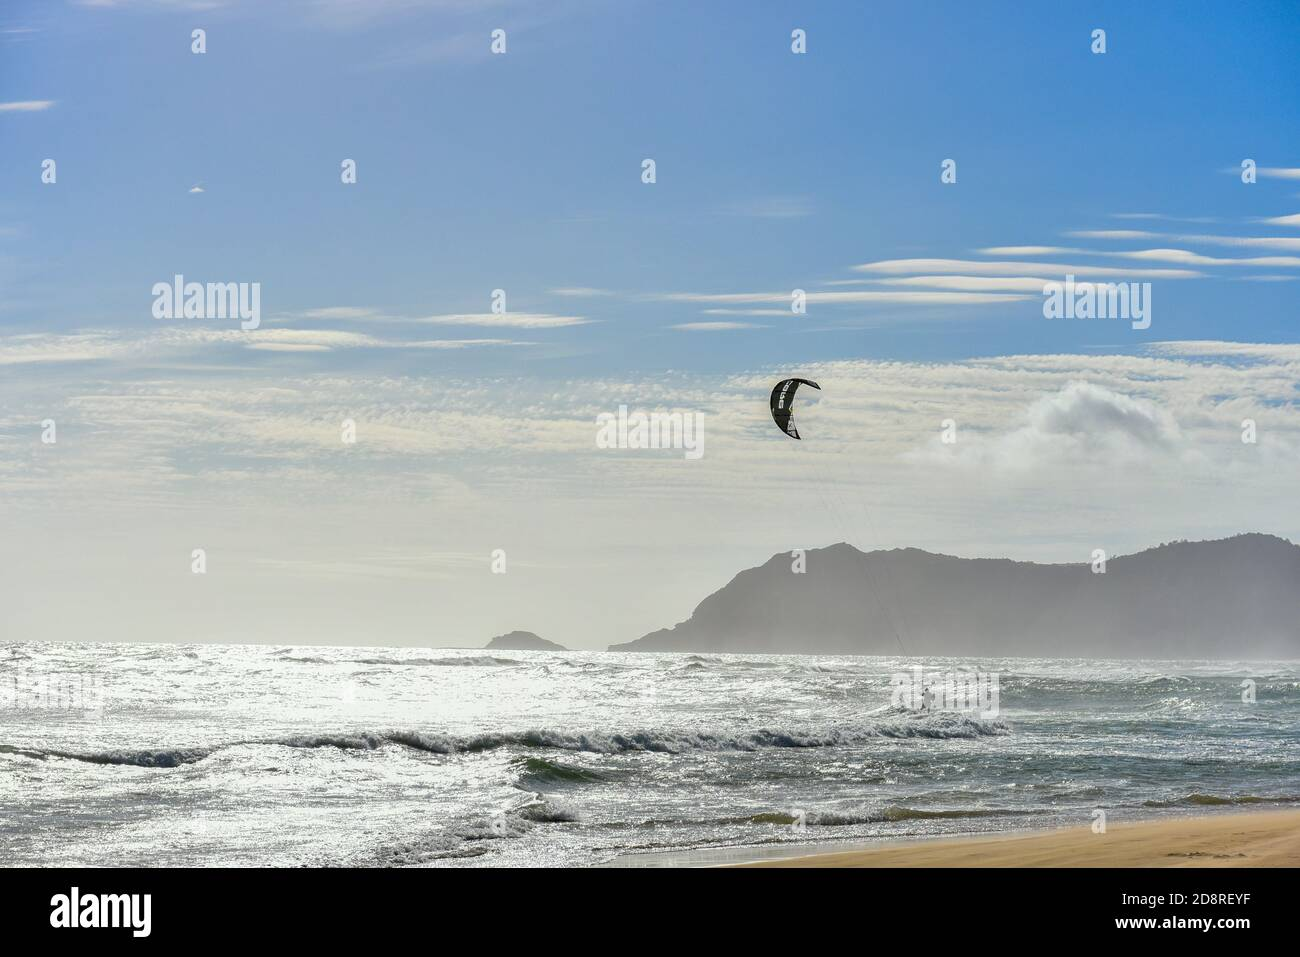 Kitesurfing/kiteboarding is a popular sport in the Garden of Eden, Sedgefield, Garden Route, South Africa Stock Photo